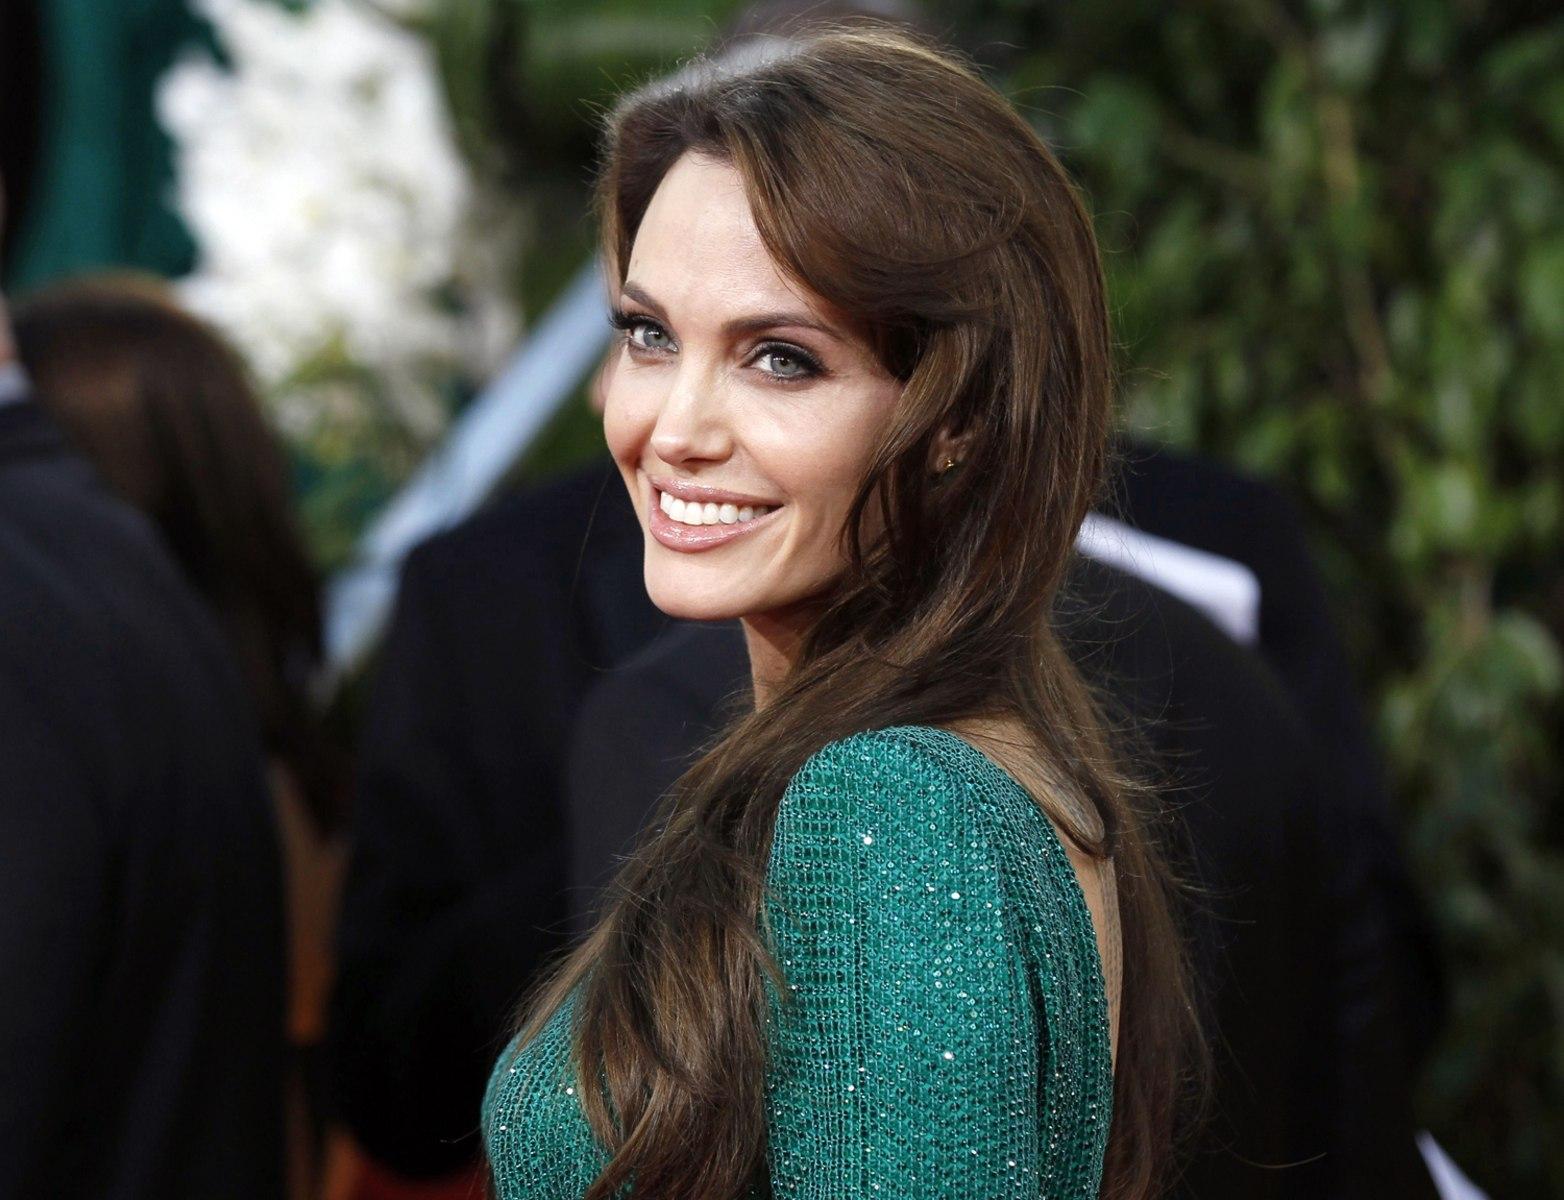 Angelina Jolie: Angelina Jolie, Brad Pitt To Team Up In 'By The Sea